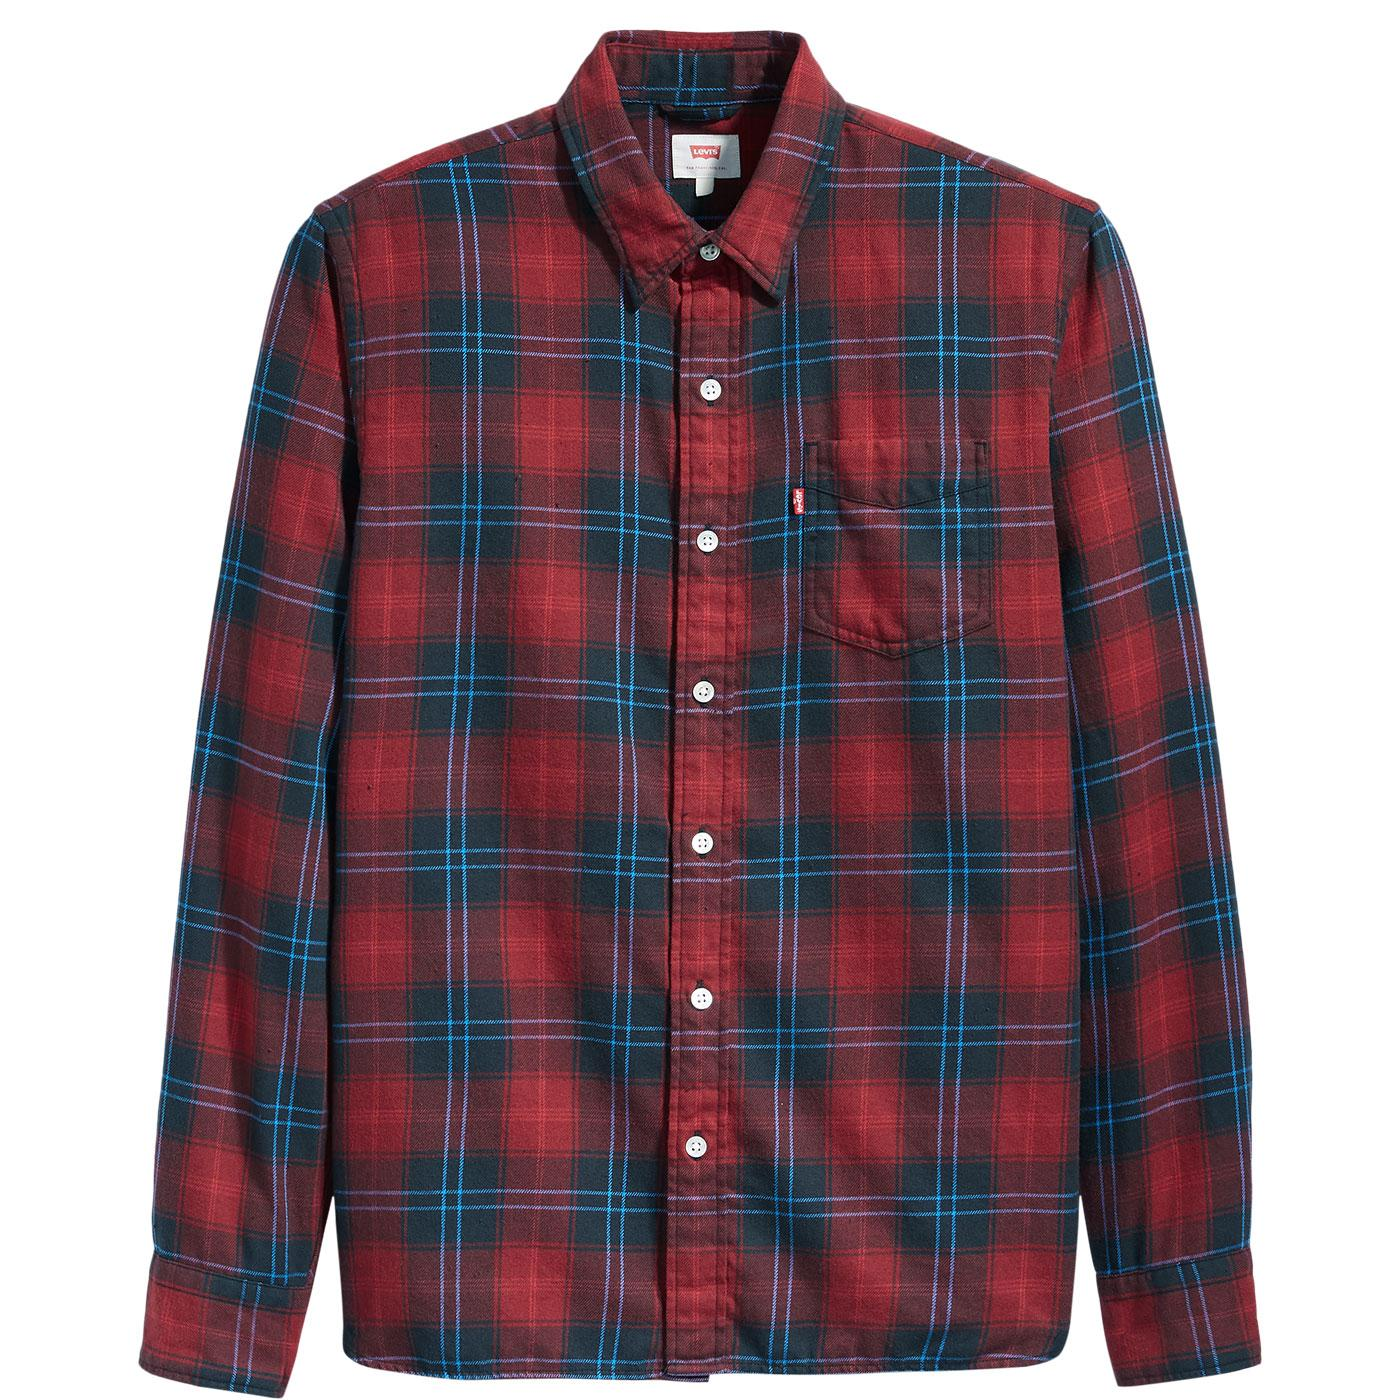 LEVI'S Sunset Pocket Cummings Graphite Check Shirt